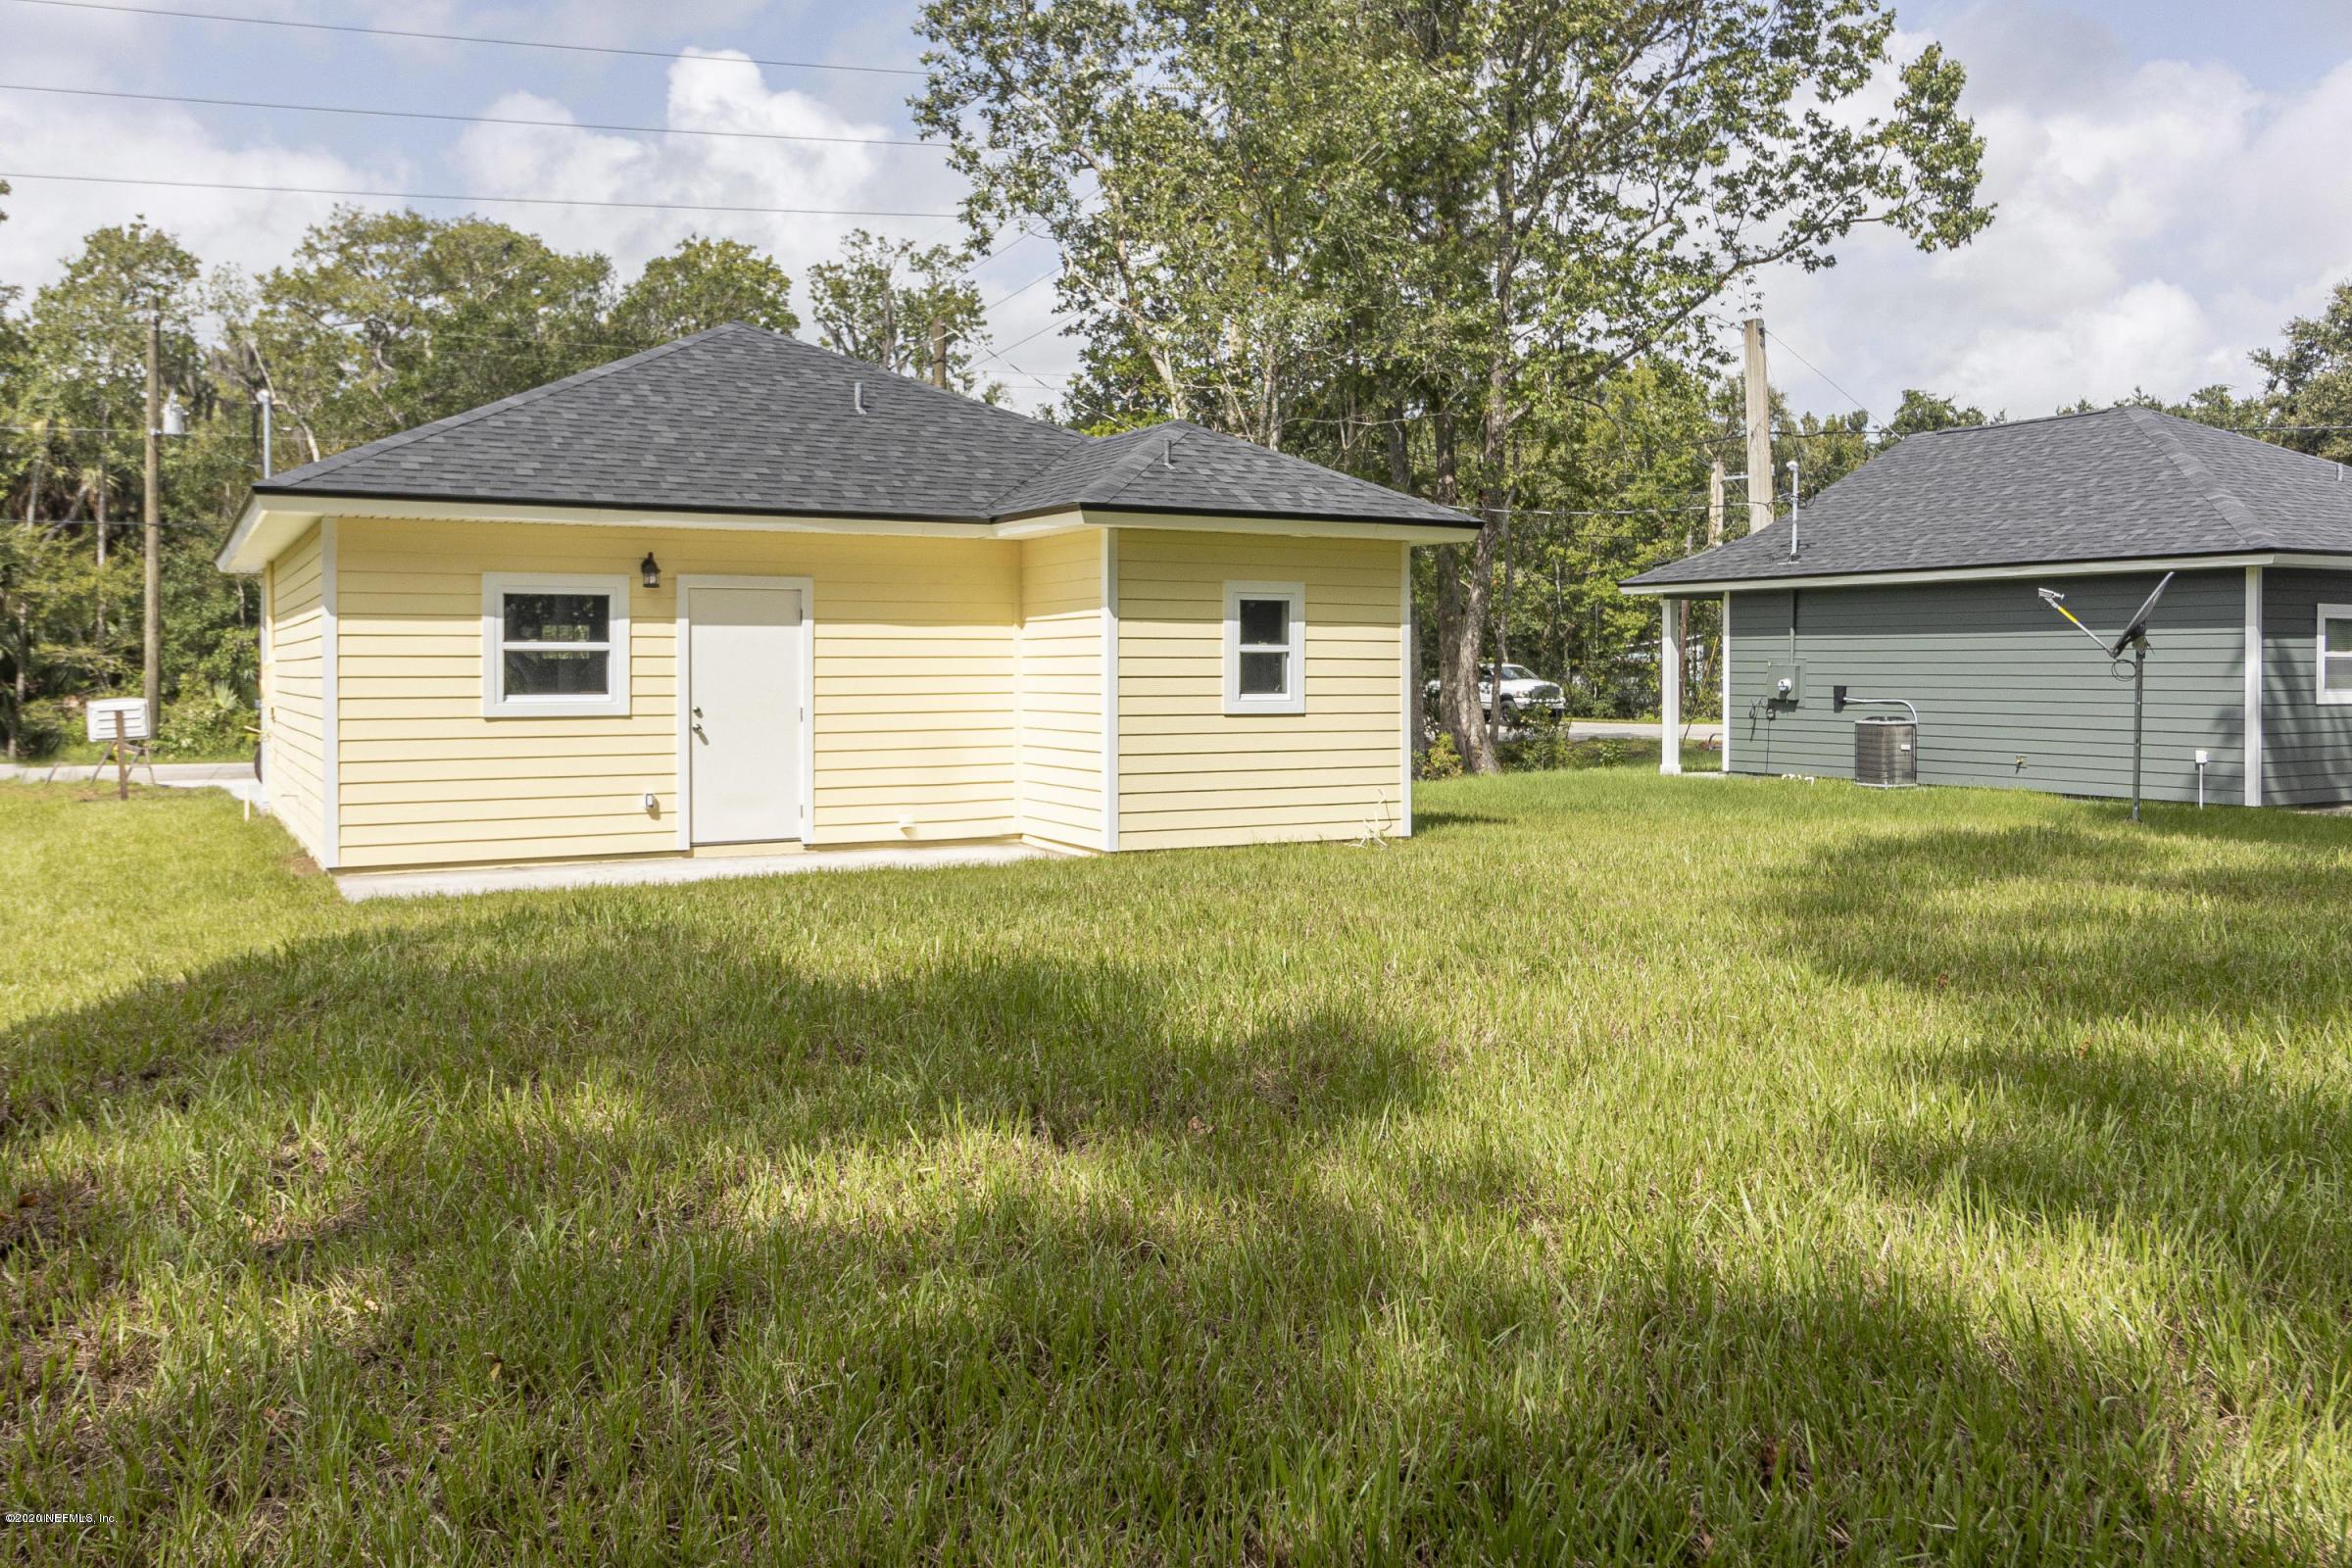 4652 AVENUE D, ST AUGUSTINE, FLORIDA 32095, 2 Bedrooms Bedrooms, ,2 BathroomsBathrooms,Rental,For Rent,AVENUE D,1083280